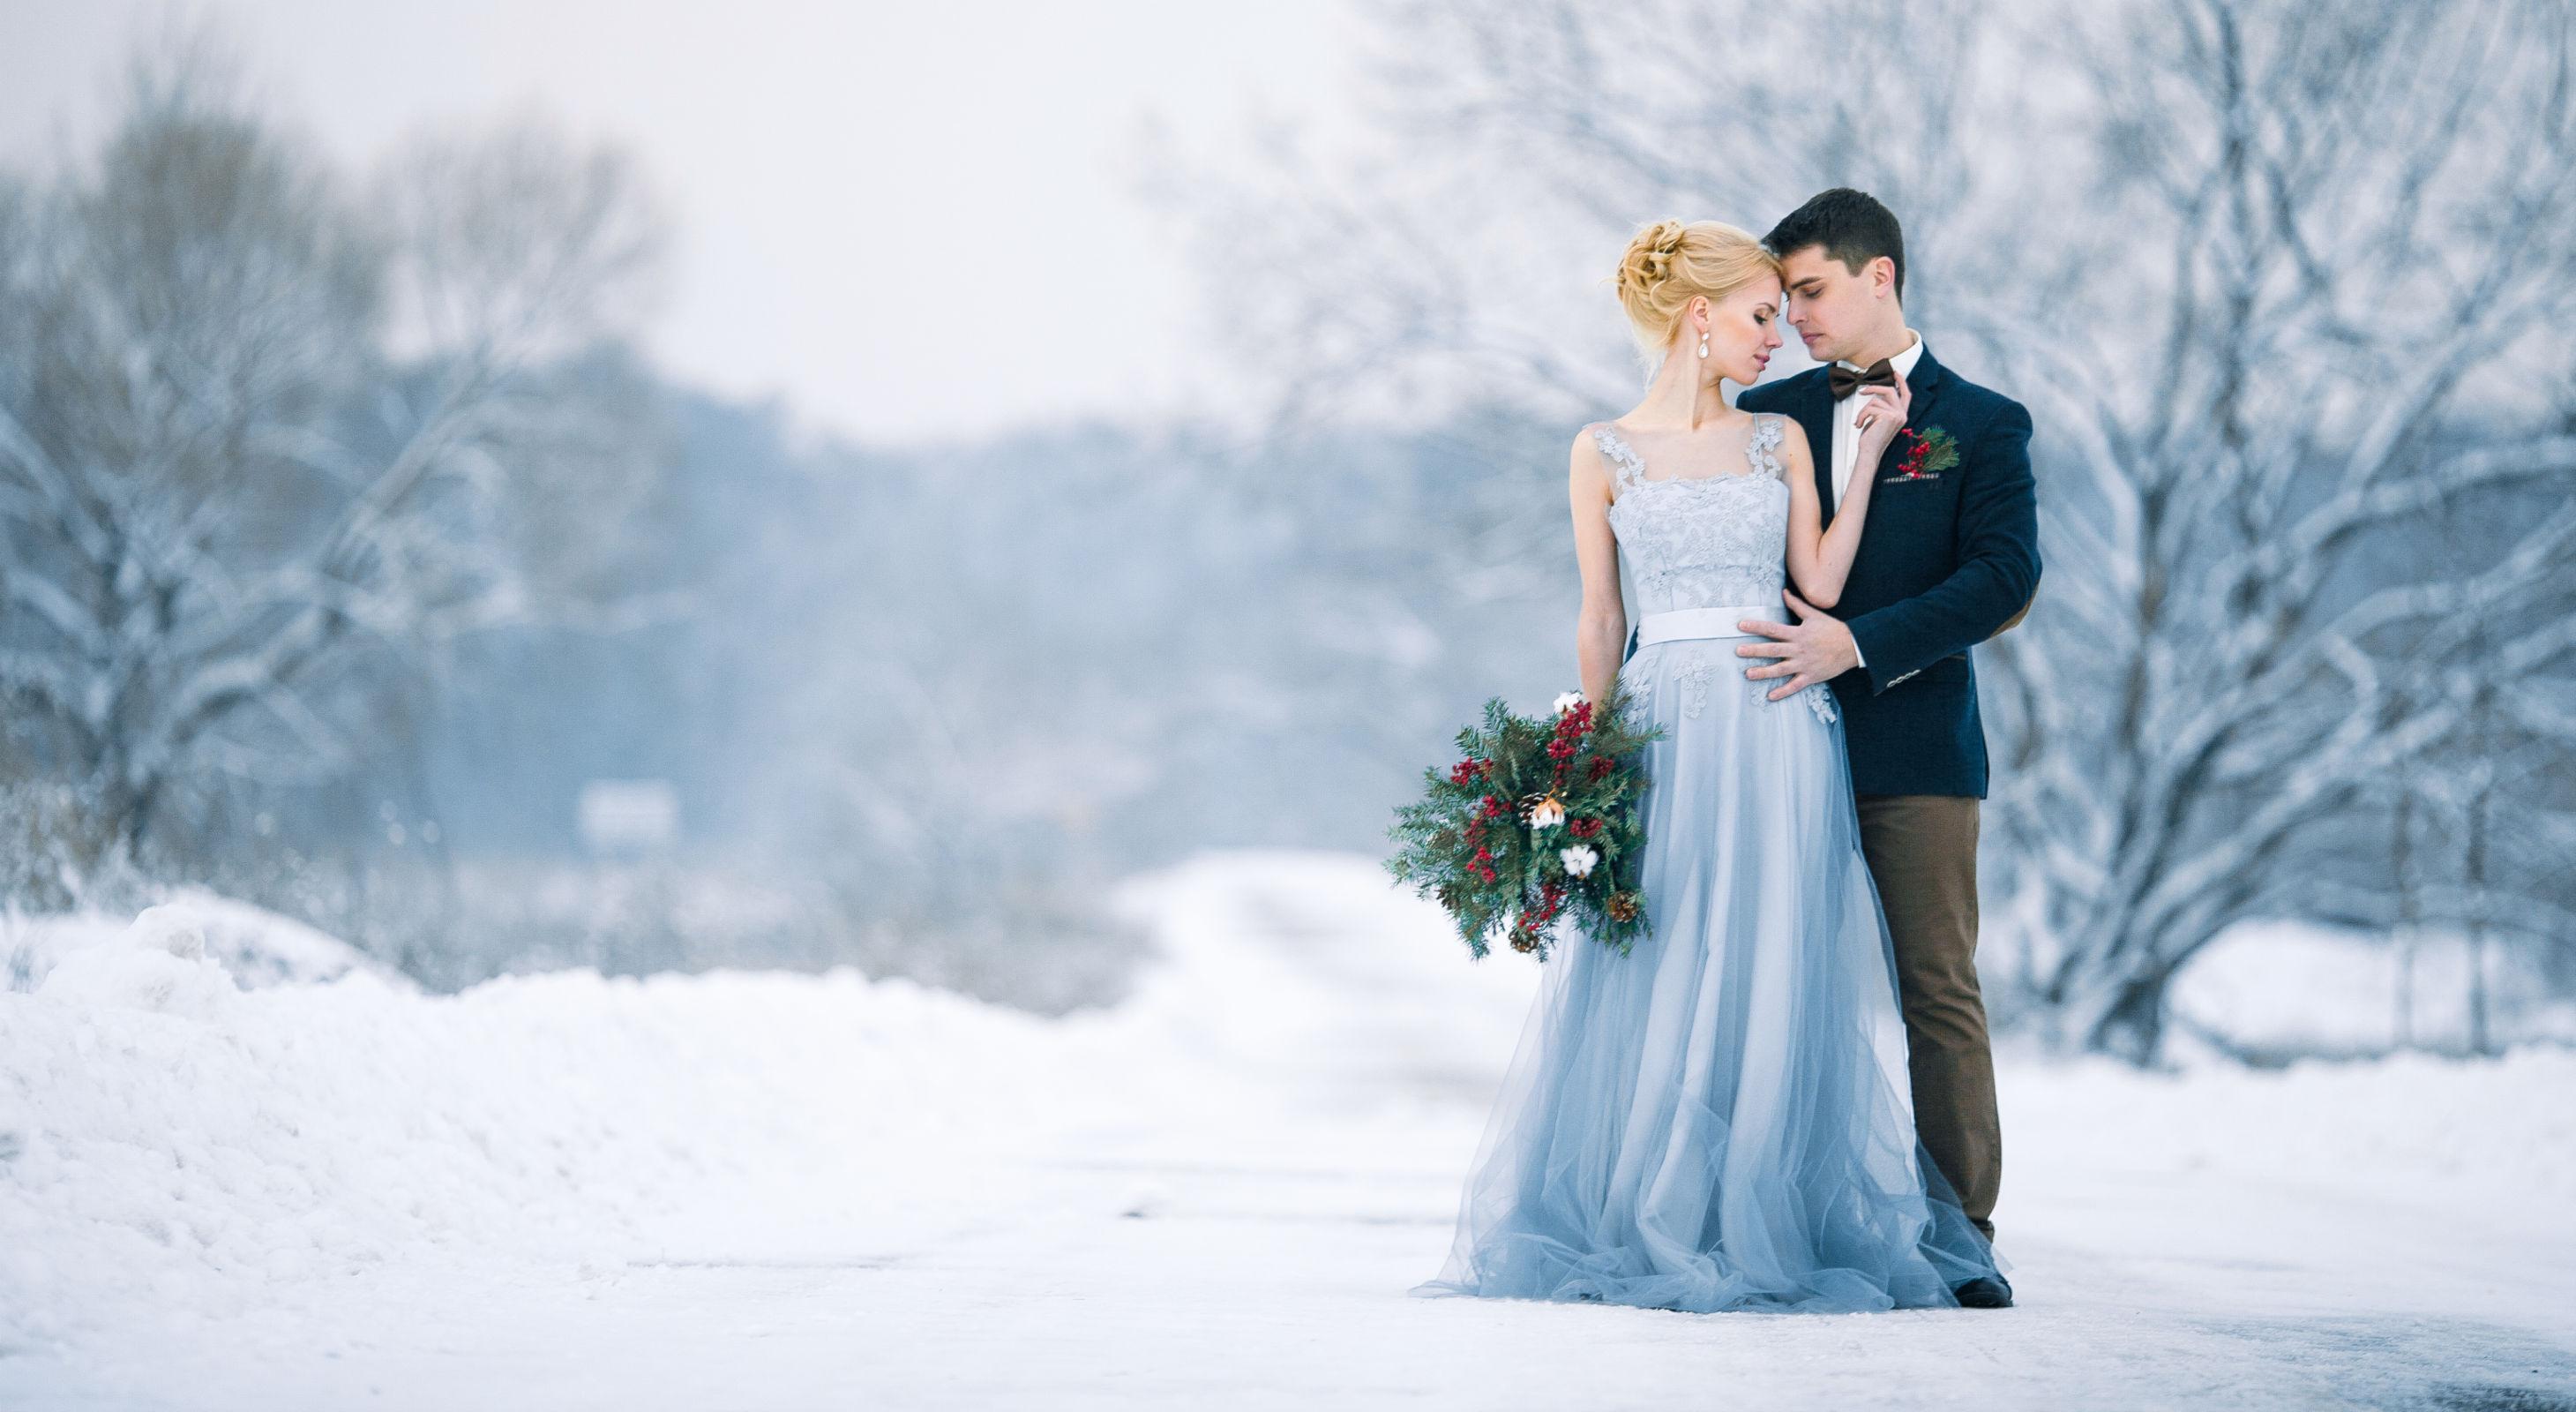 Wedding-Marketing-Agency-Winter-Weddings